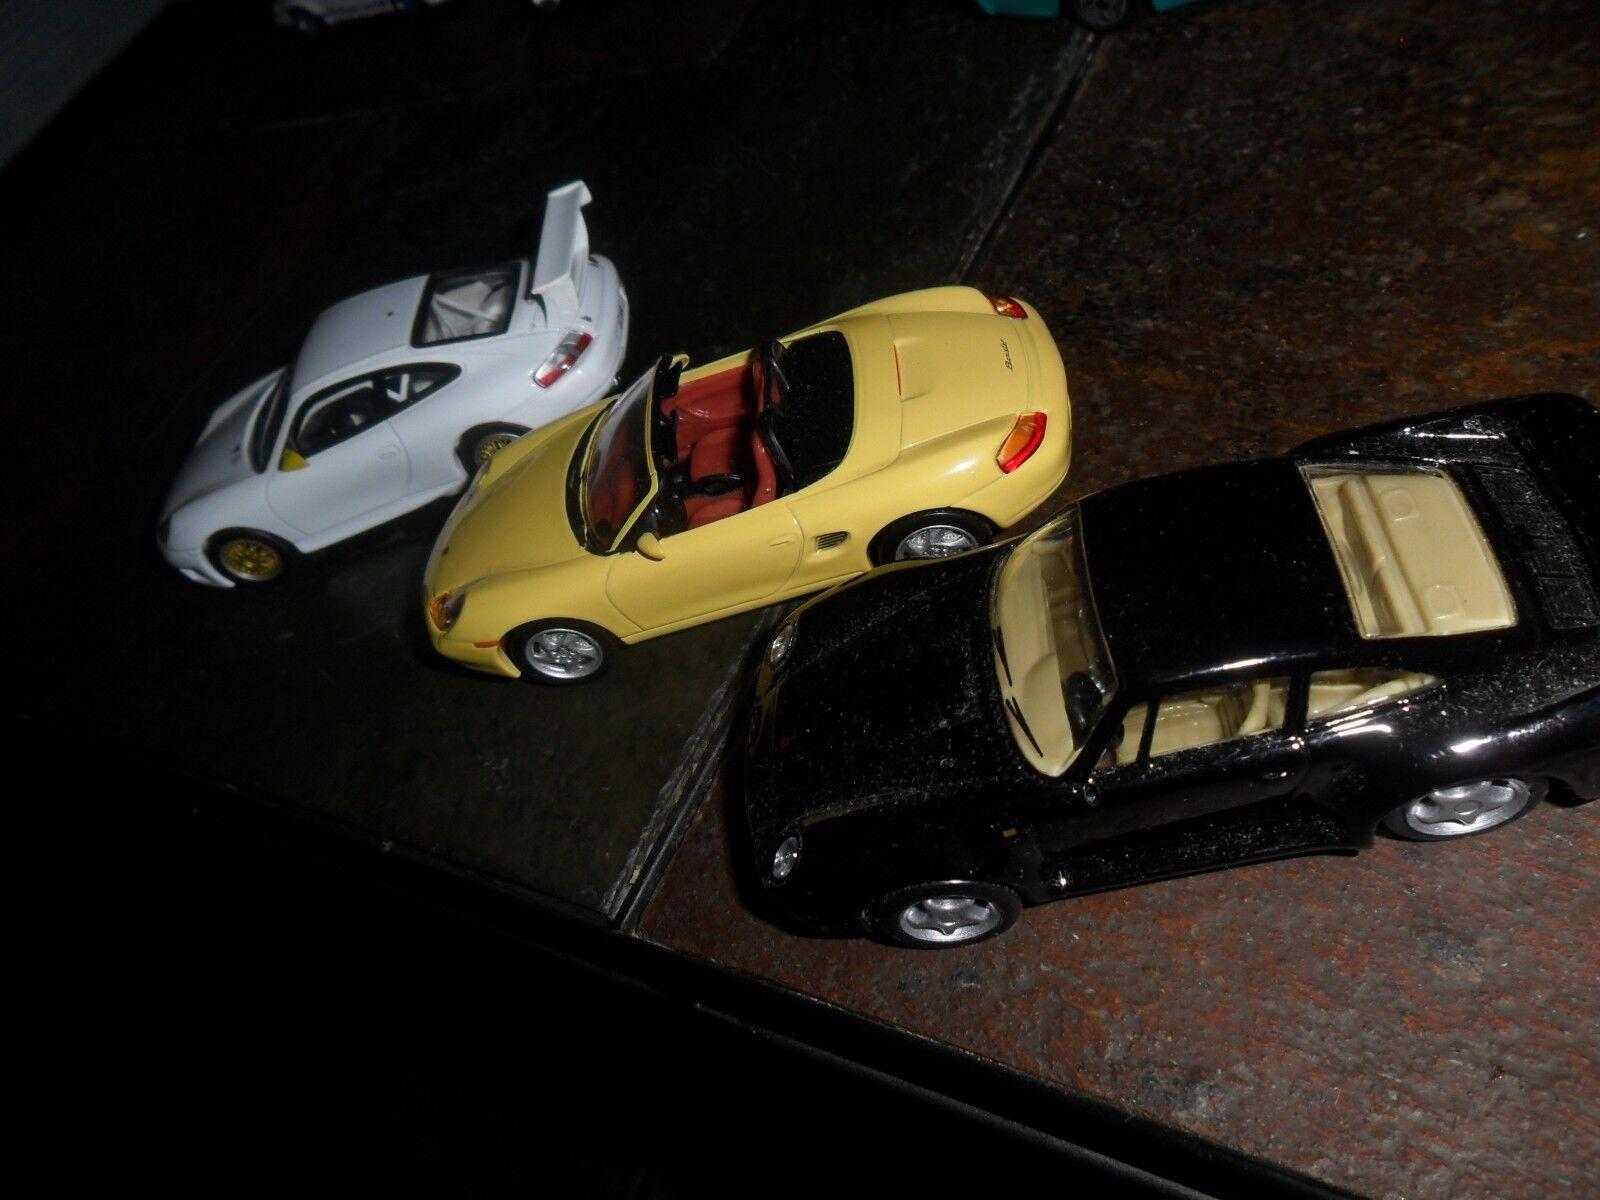 3 CAR LOT 1 43 DeAgostini DeAgostini DeAgostini High Speed 911 Porsche Boxster 911 959 be9d88